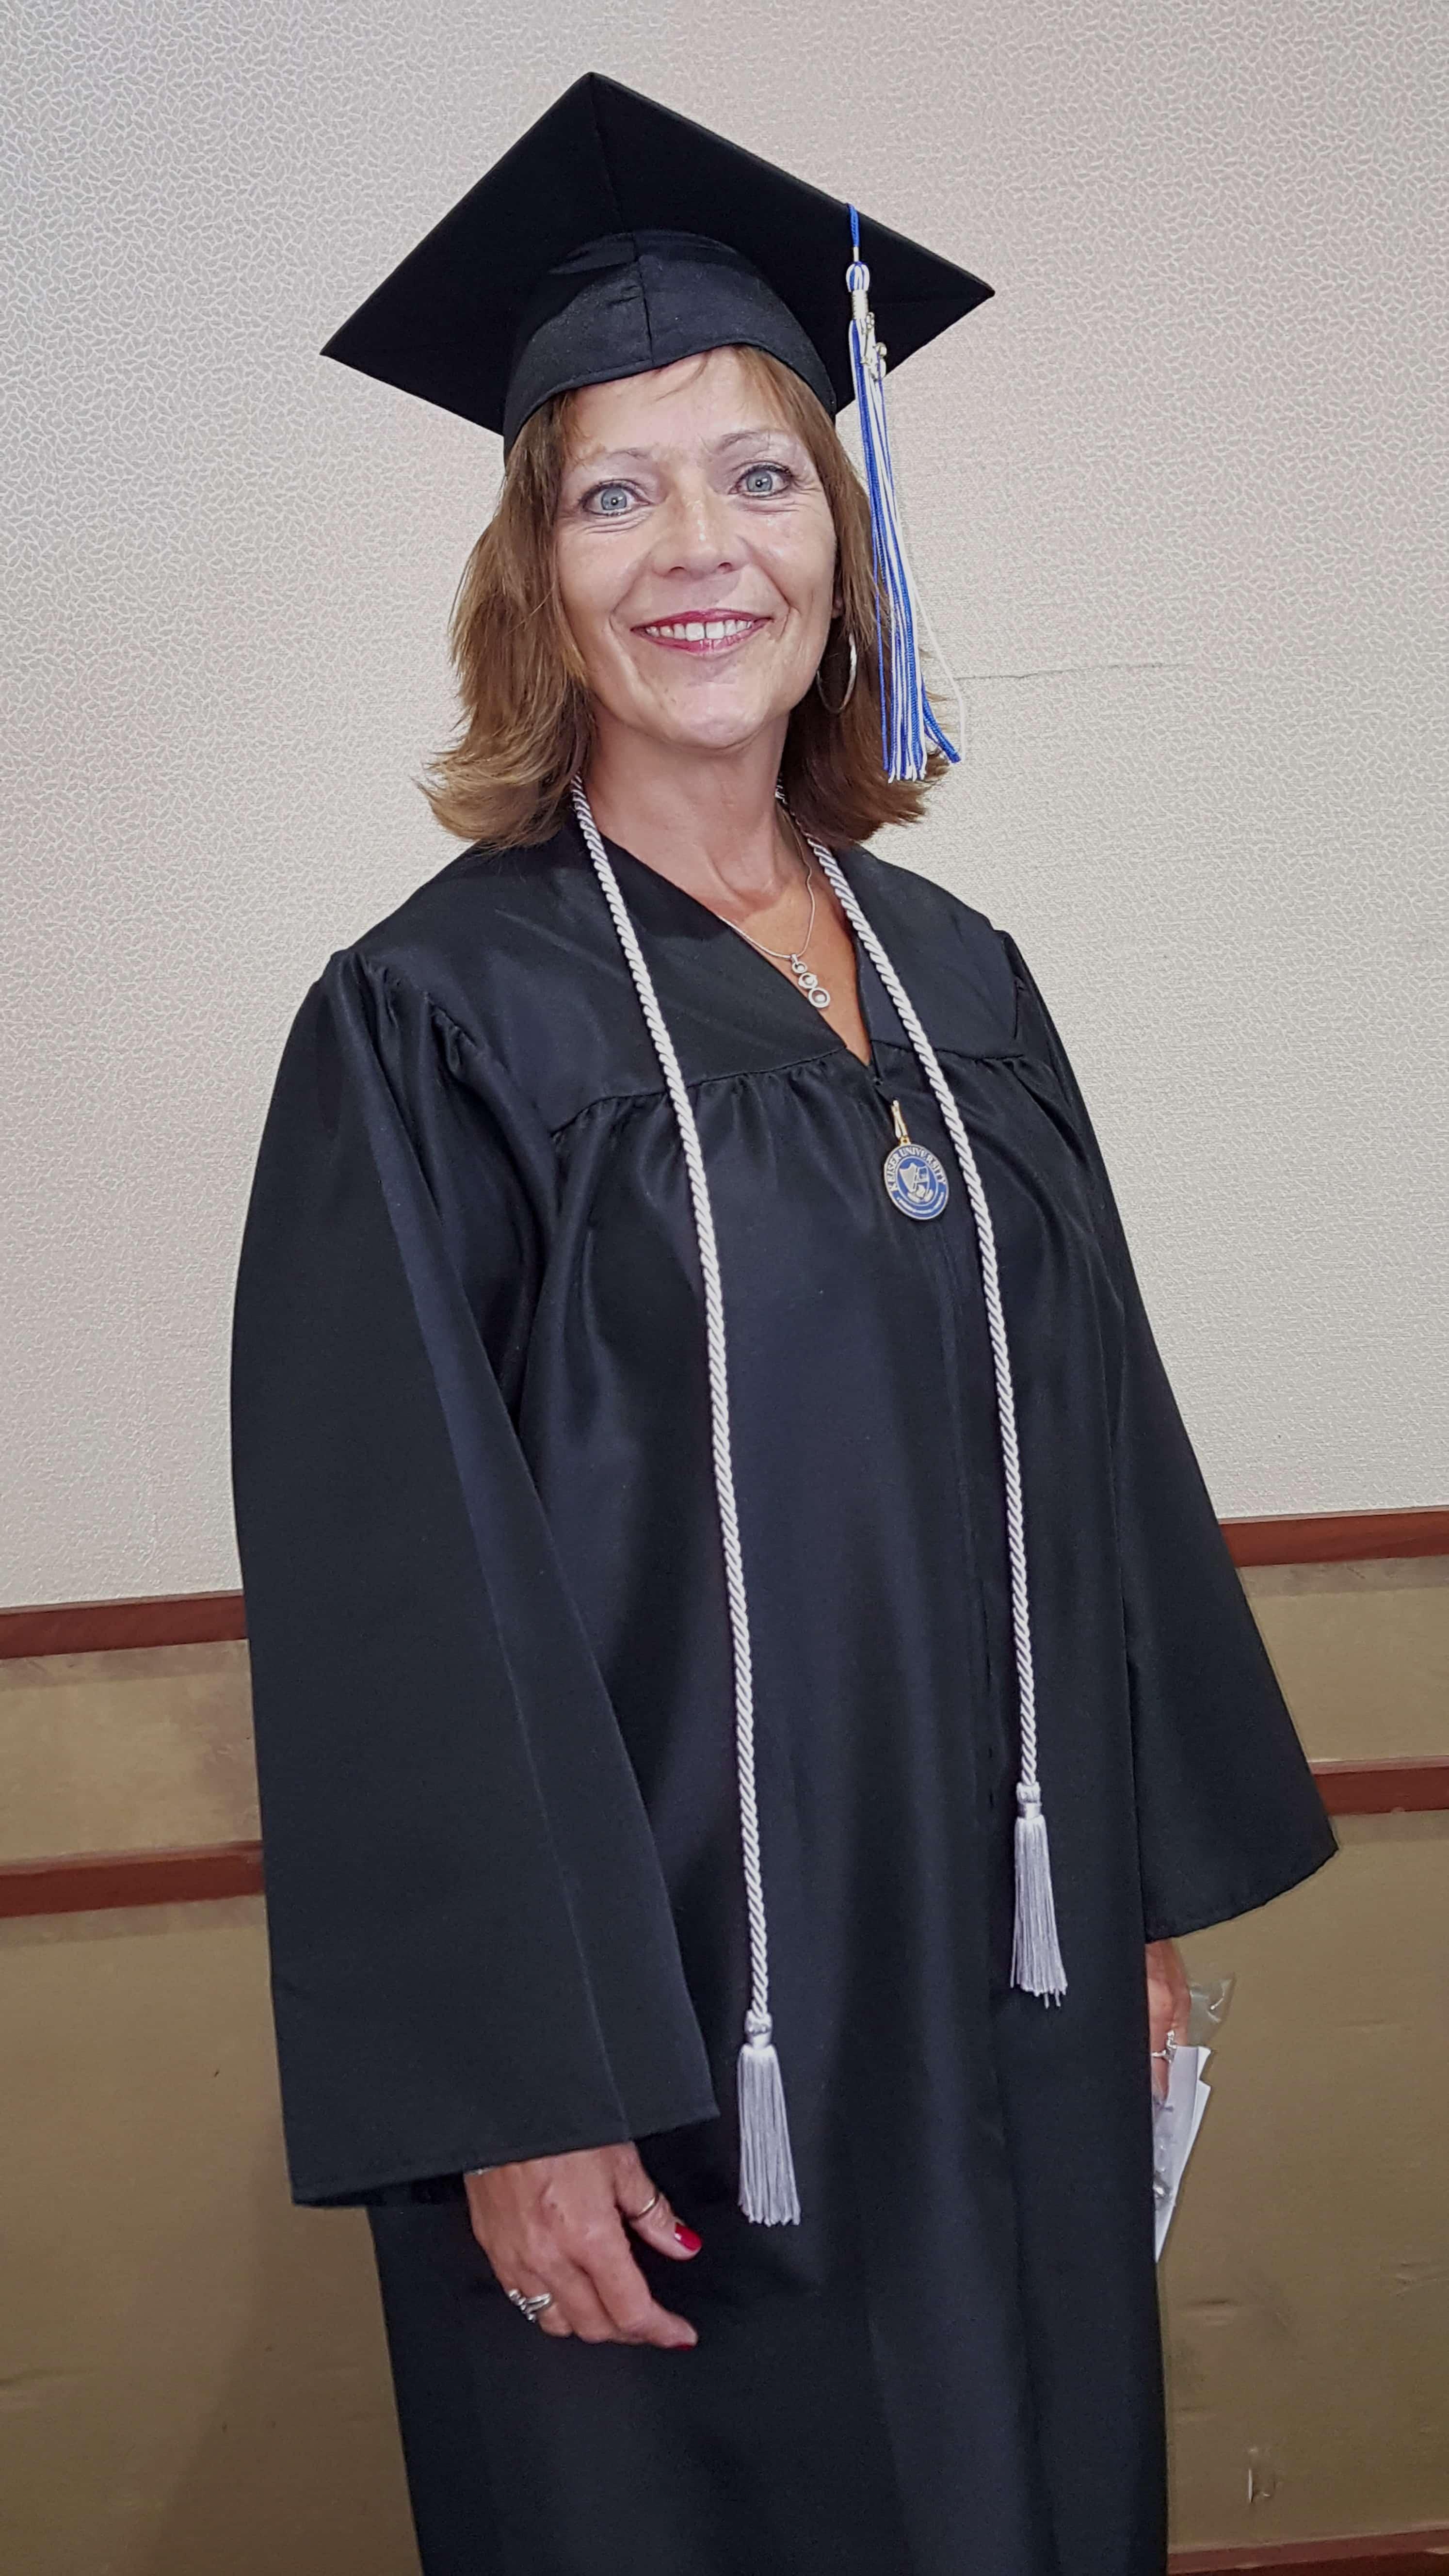 GRADUATE SPOTLIGHT: Belinda Haney, KU Jacksonville